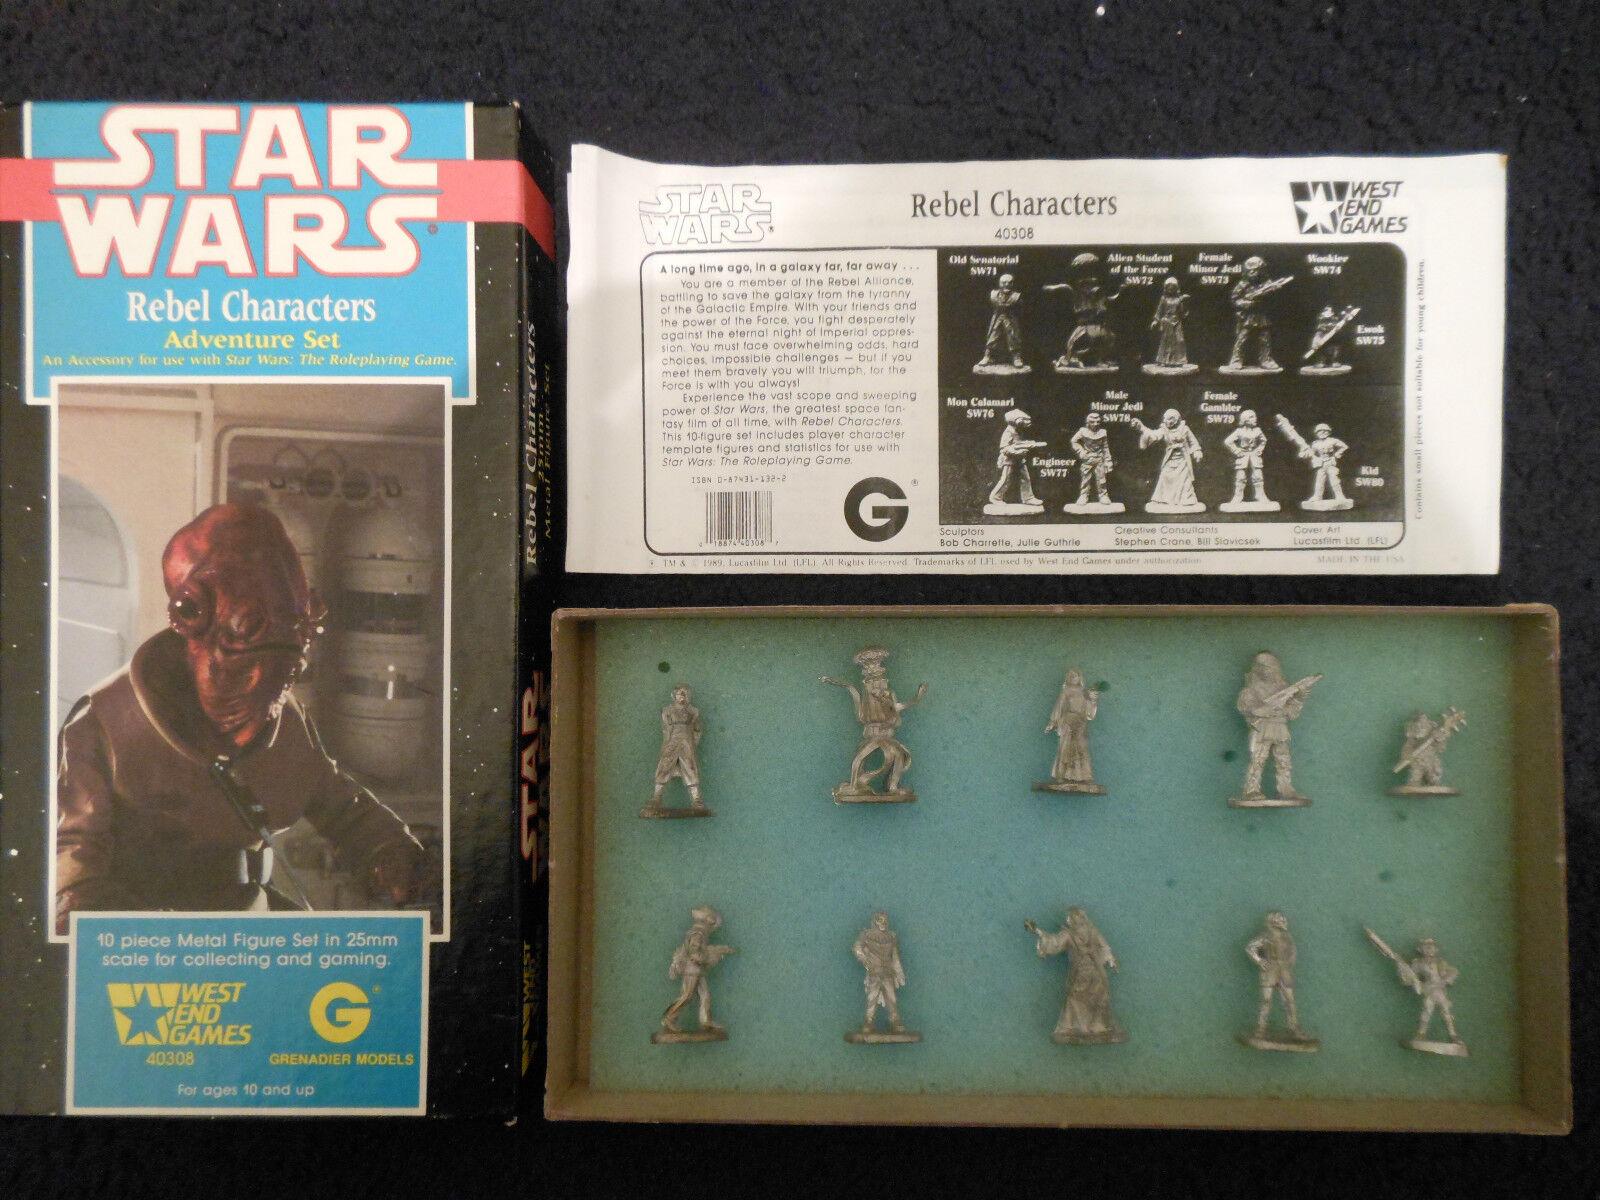 1989 Rebel caracteres Granadero West End Games Star Wars Aventura conjunto 40308 Weg